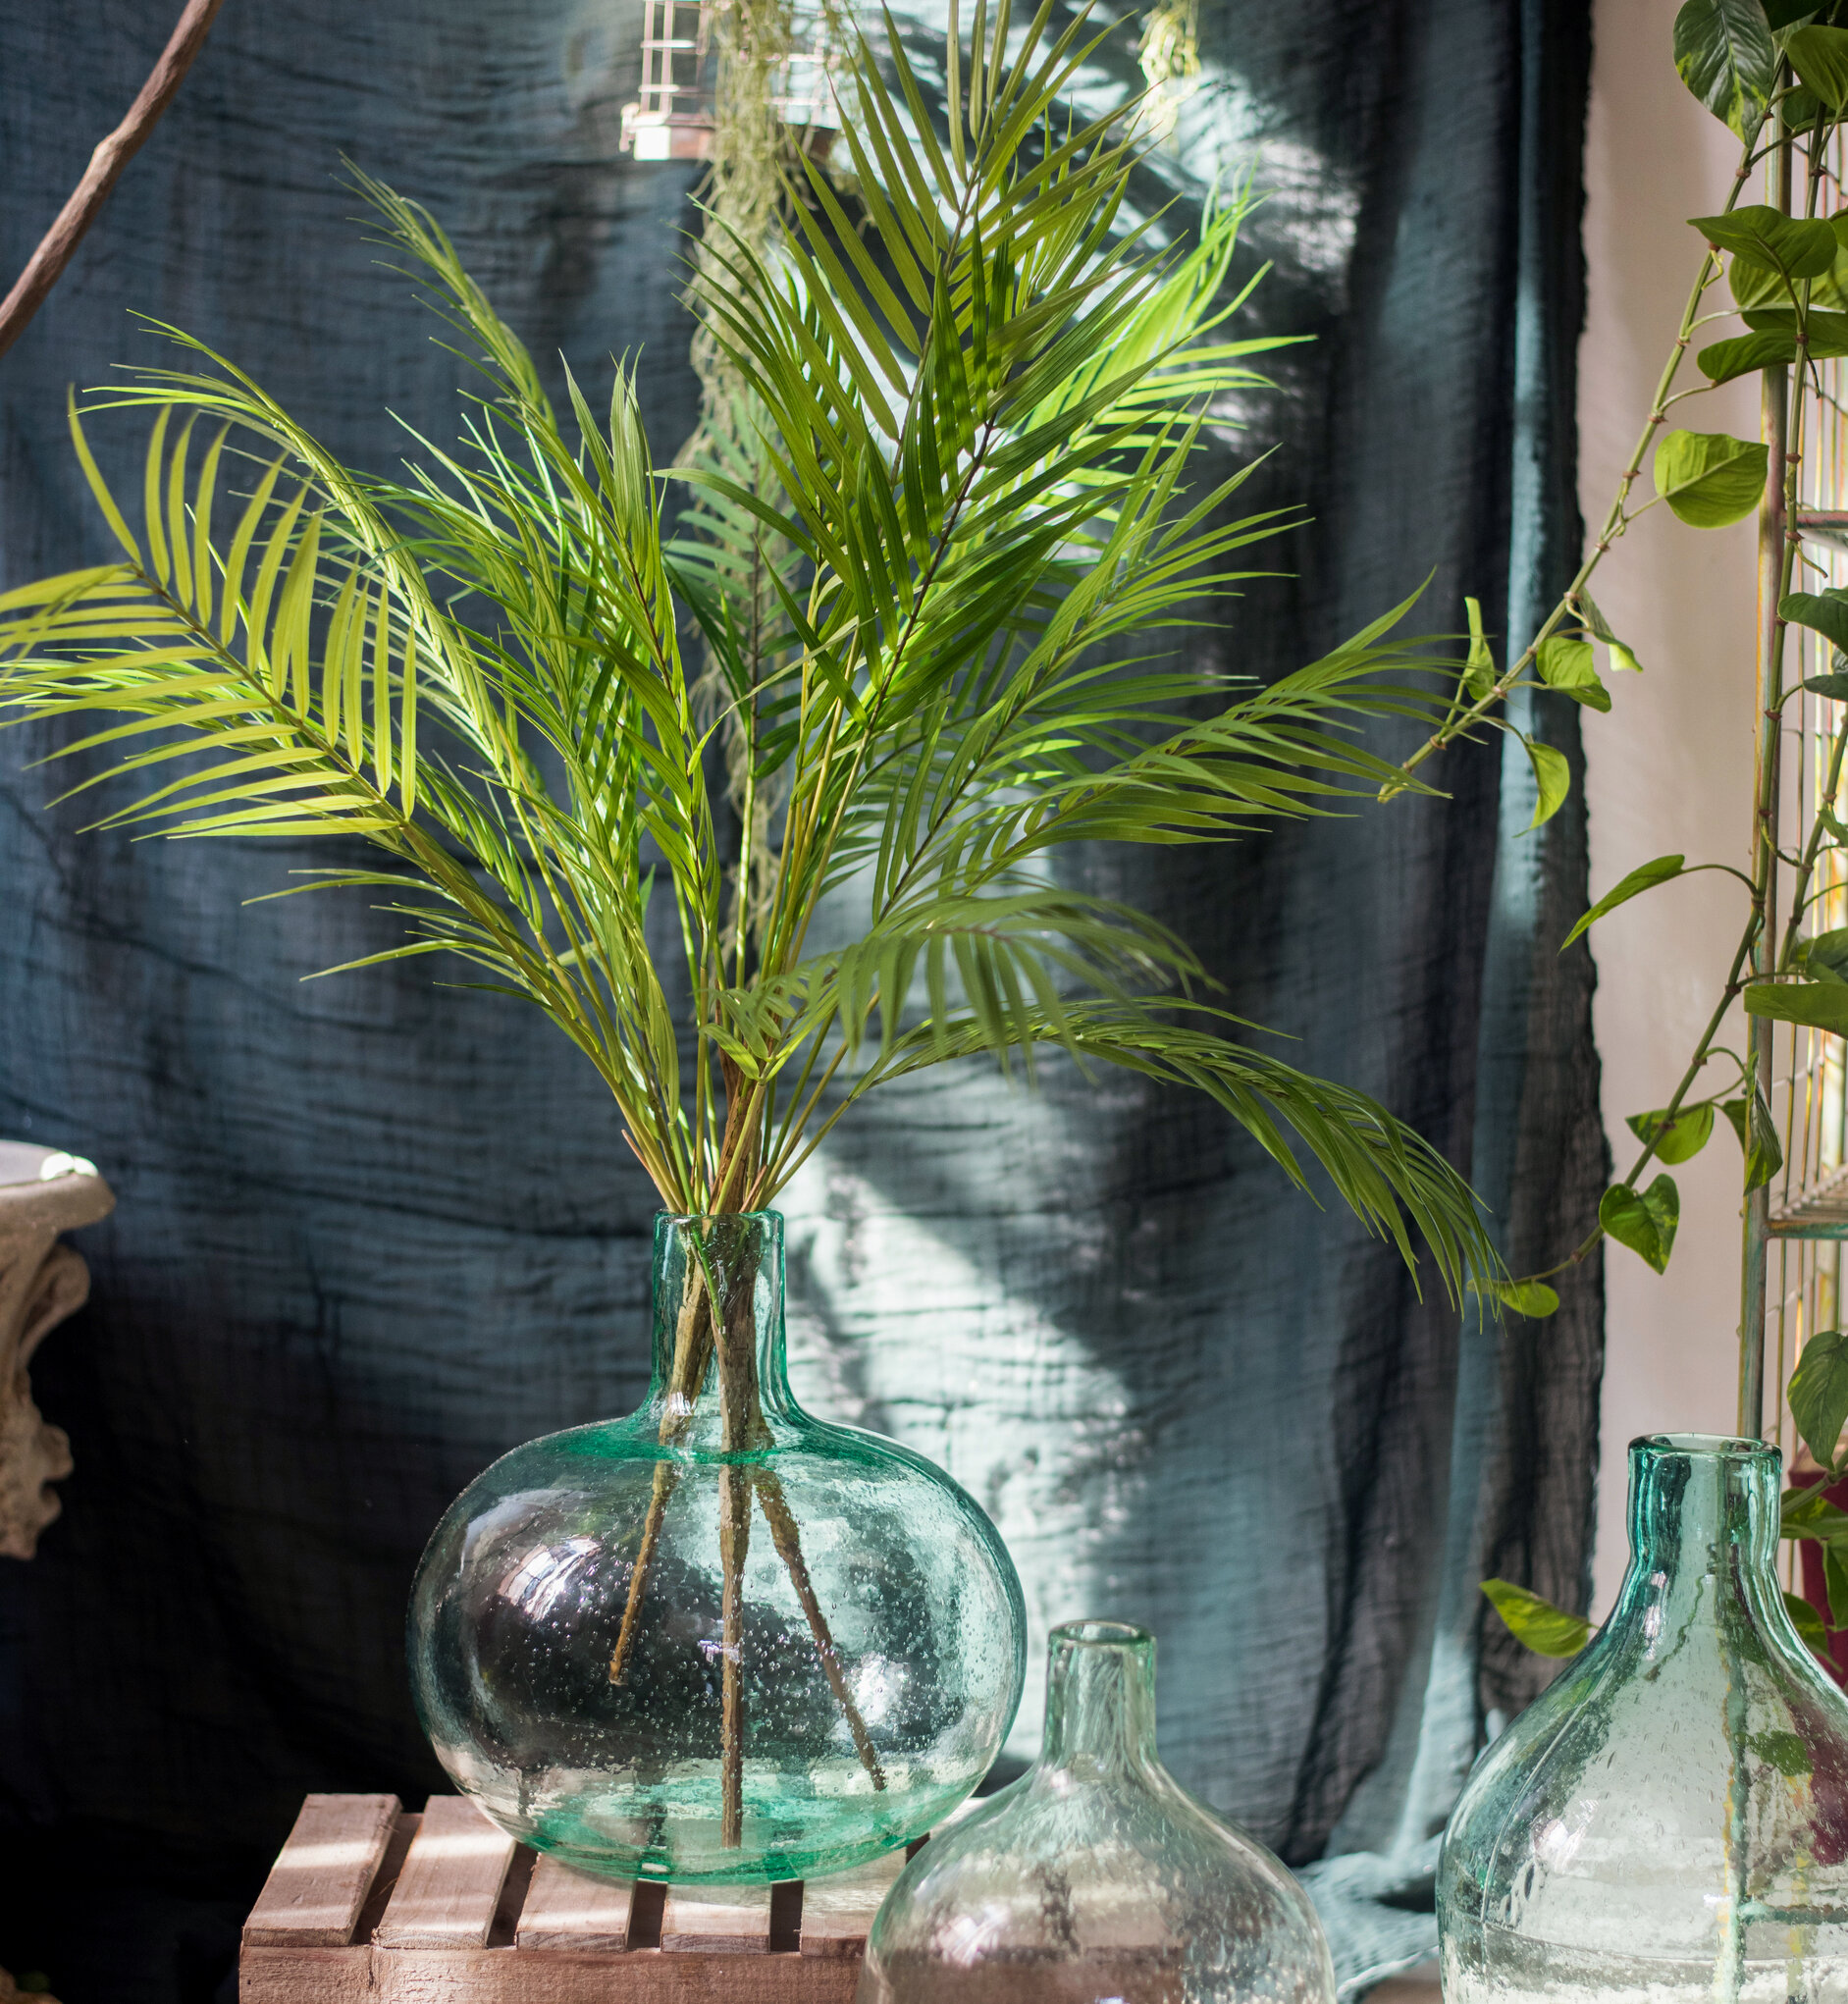 Bay Isle Home 5 Piece 9 Leaf Stem Artificial Bundle Kwai Grass Set Wayfair